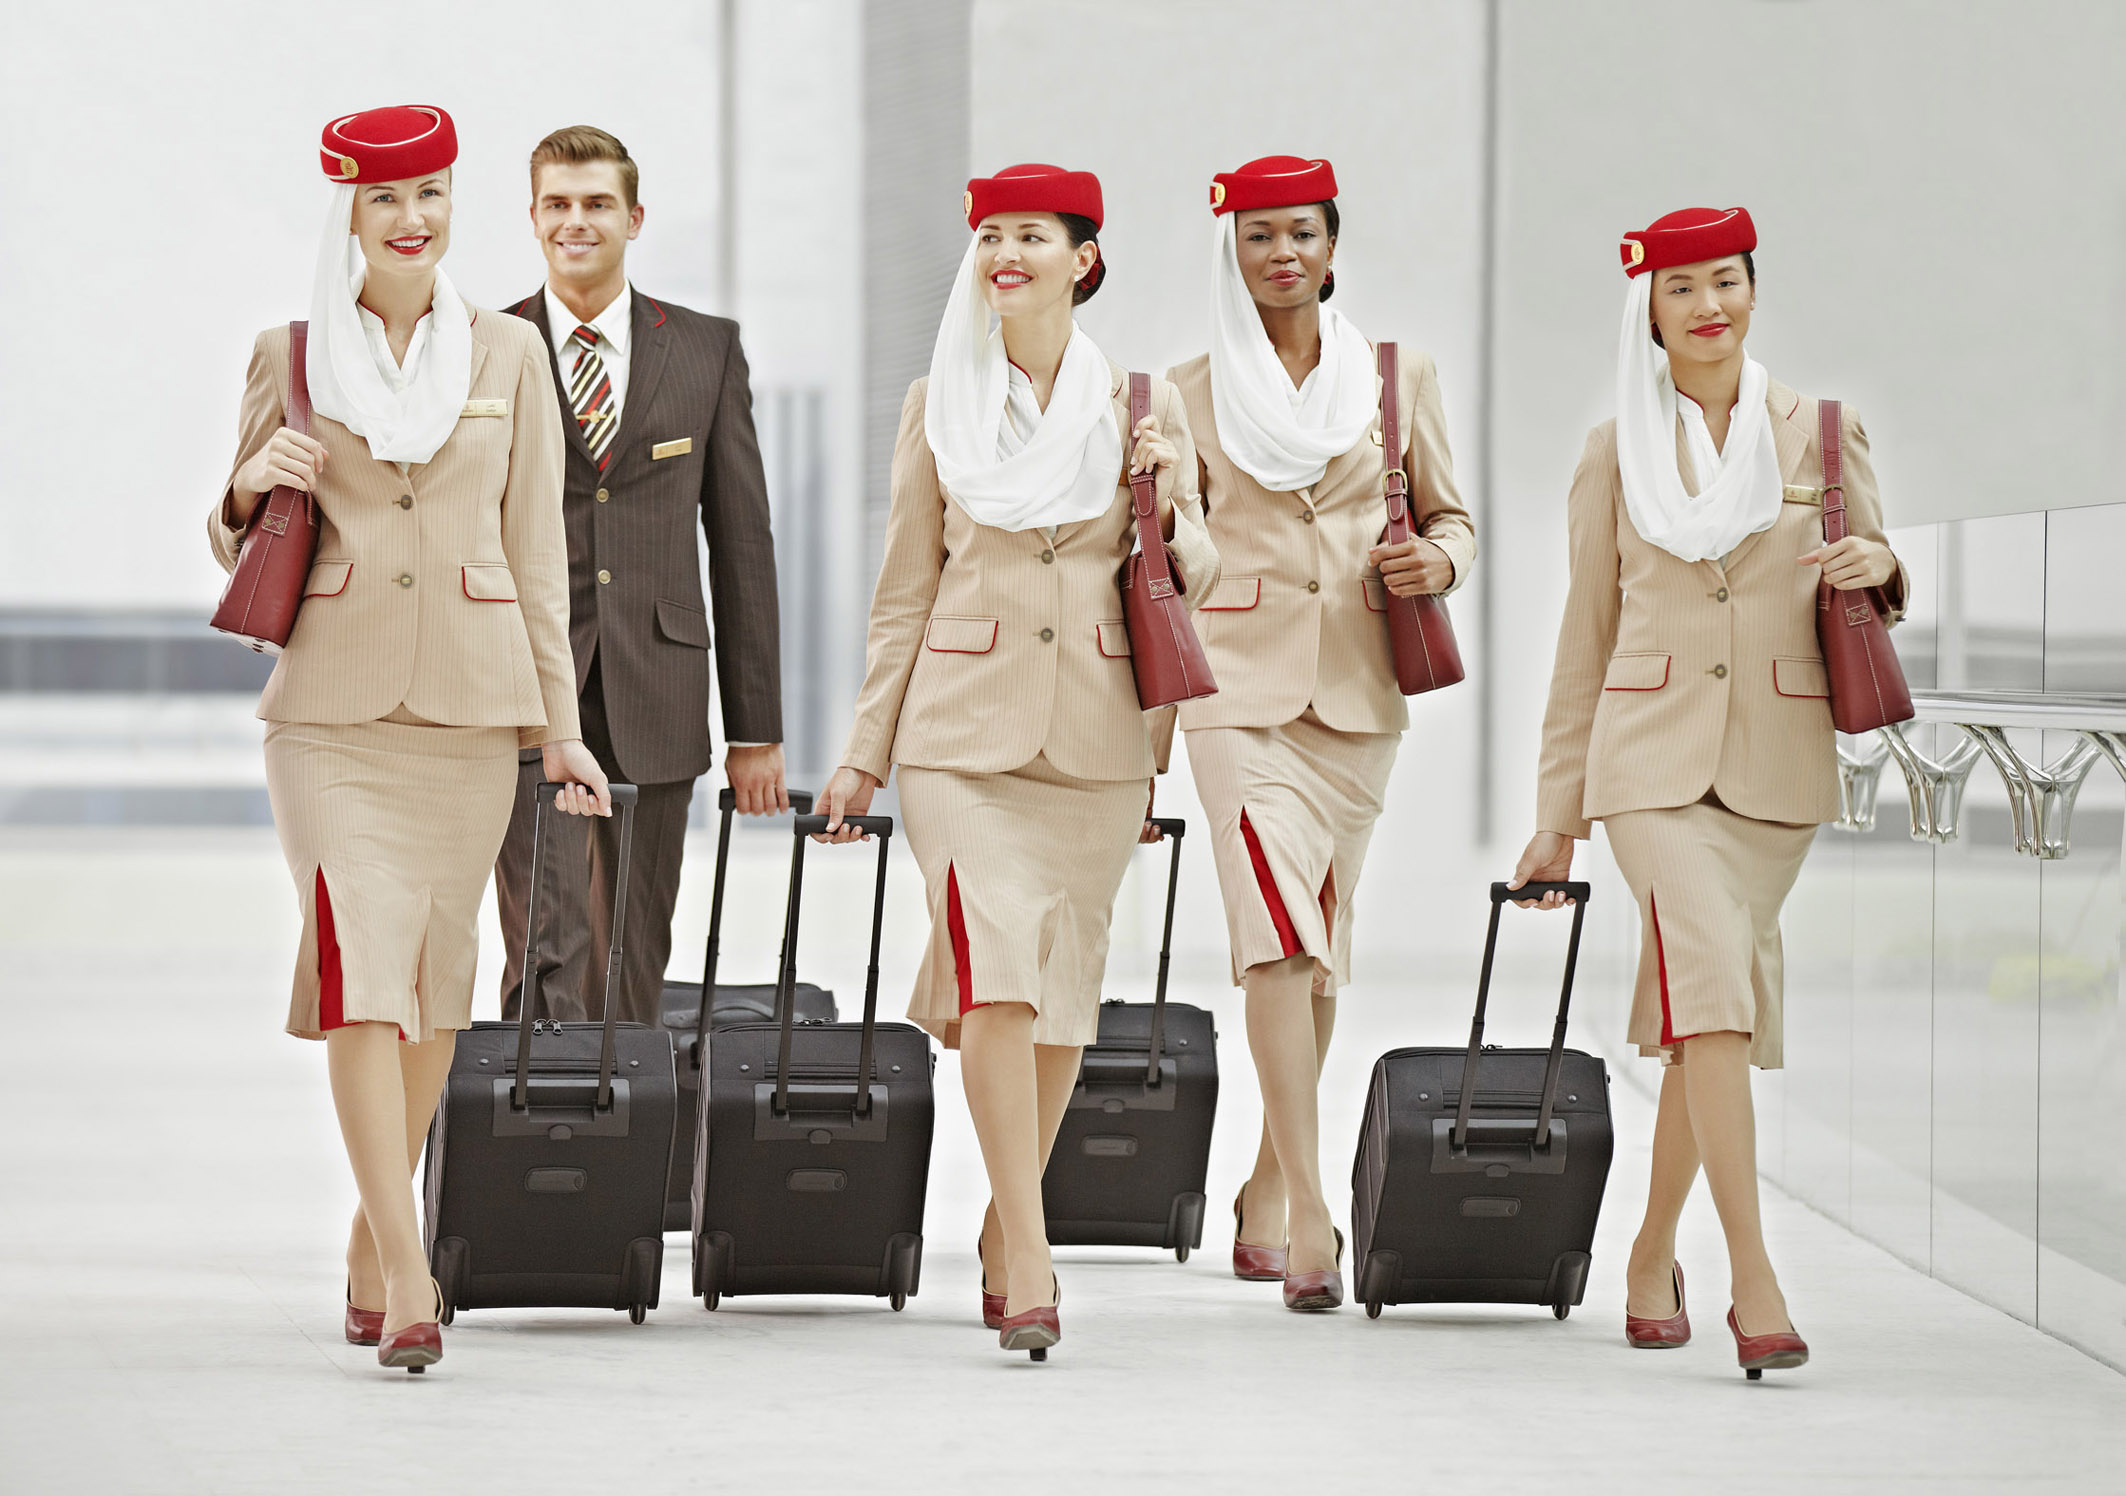 Emirates busca 3.000 Tripulantes de Cabina